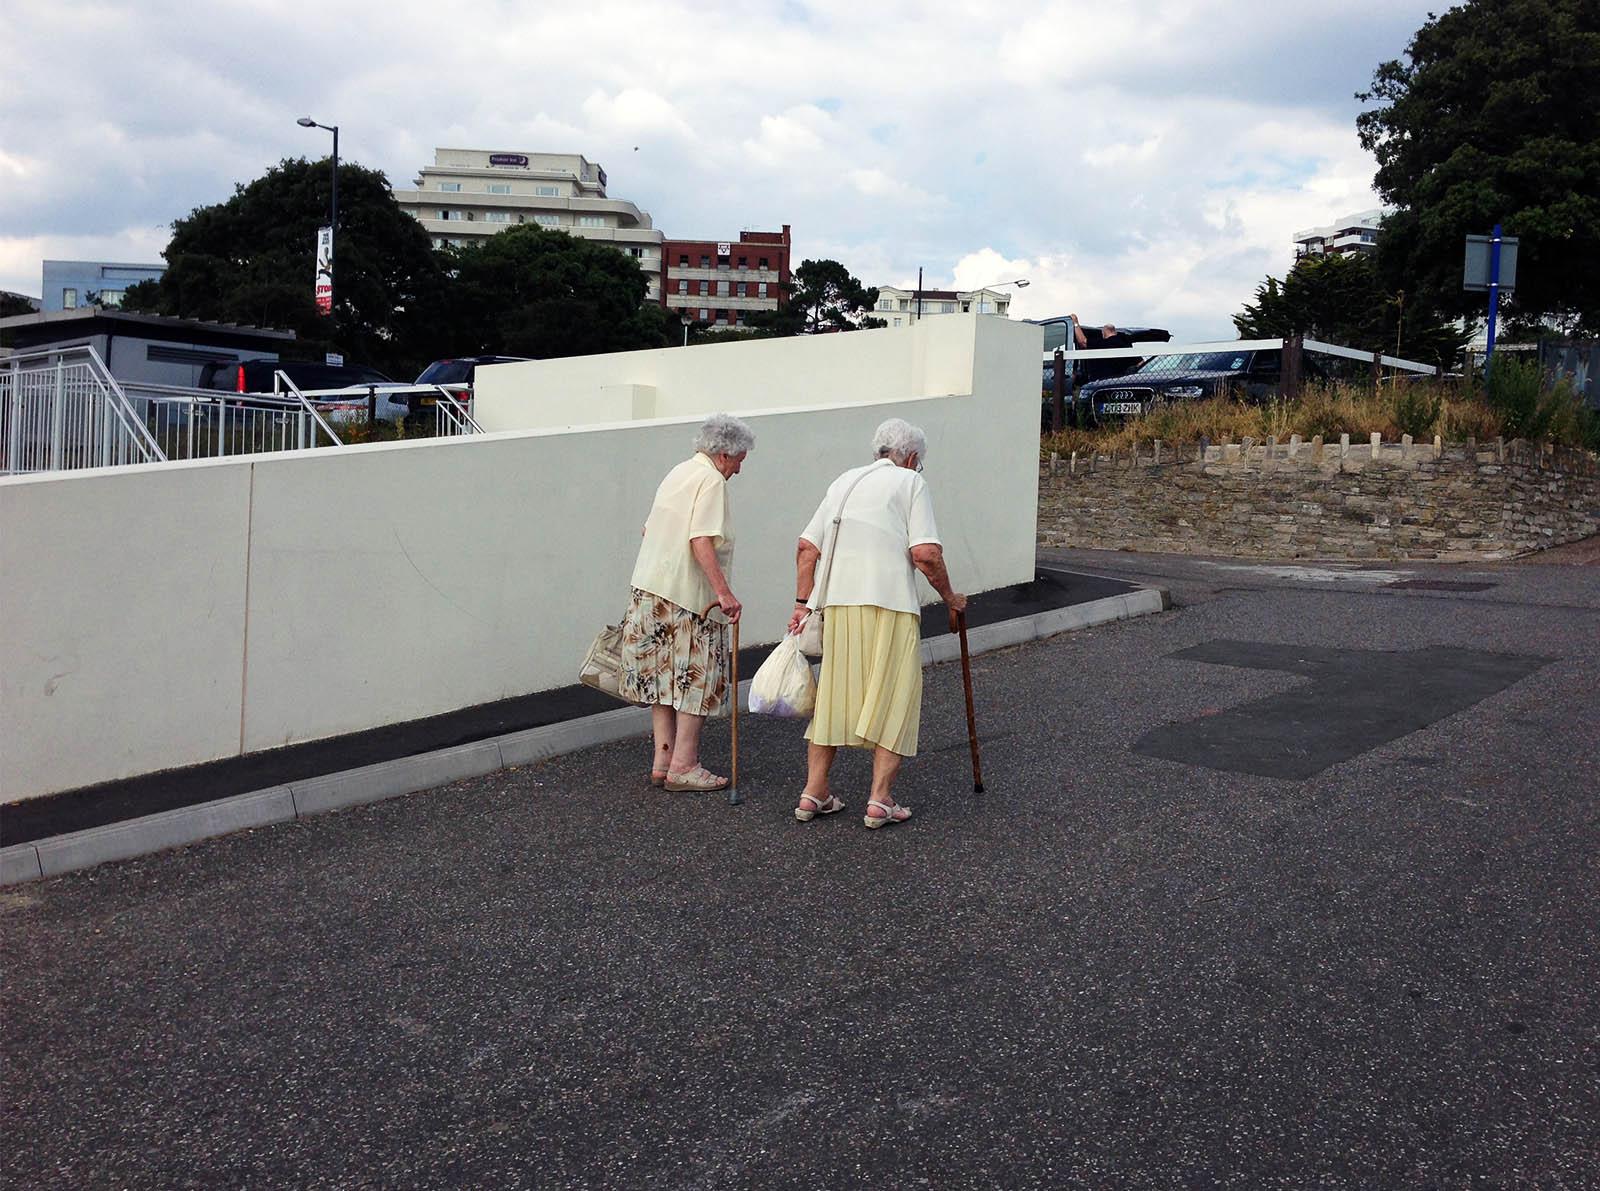 The grannies.